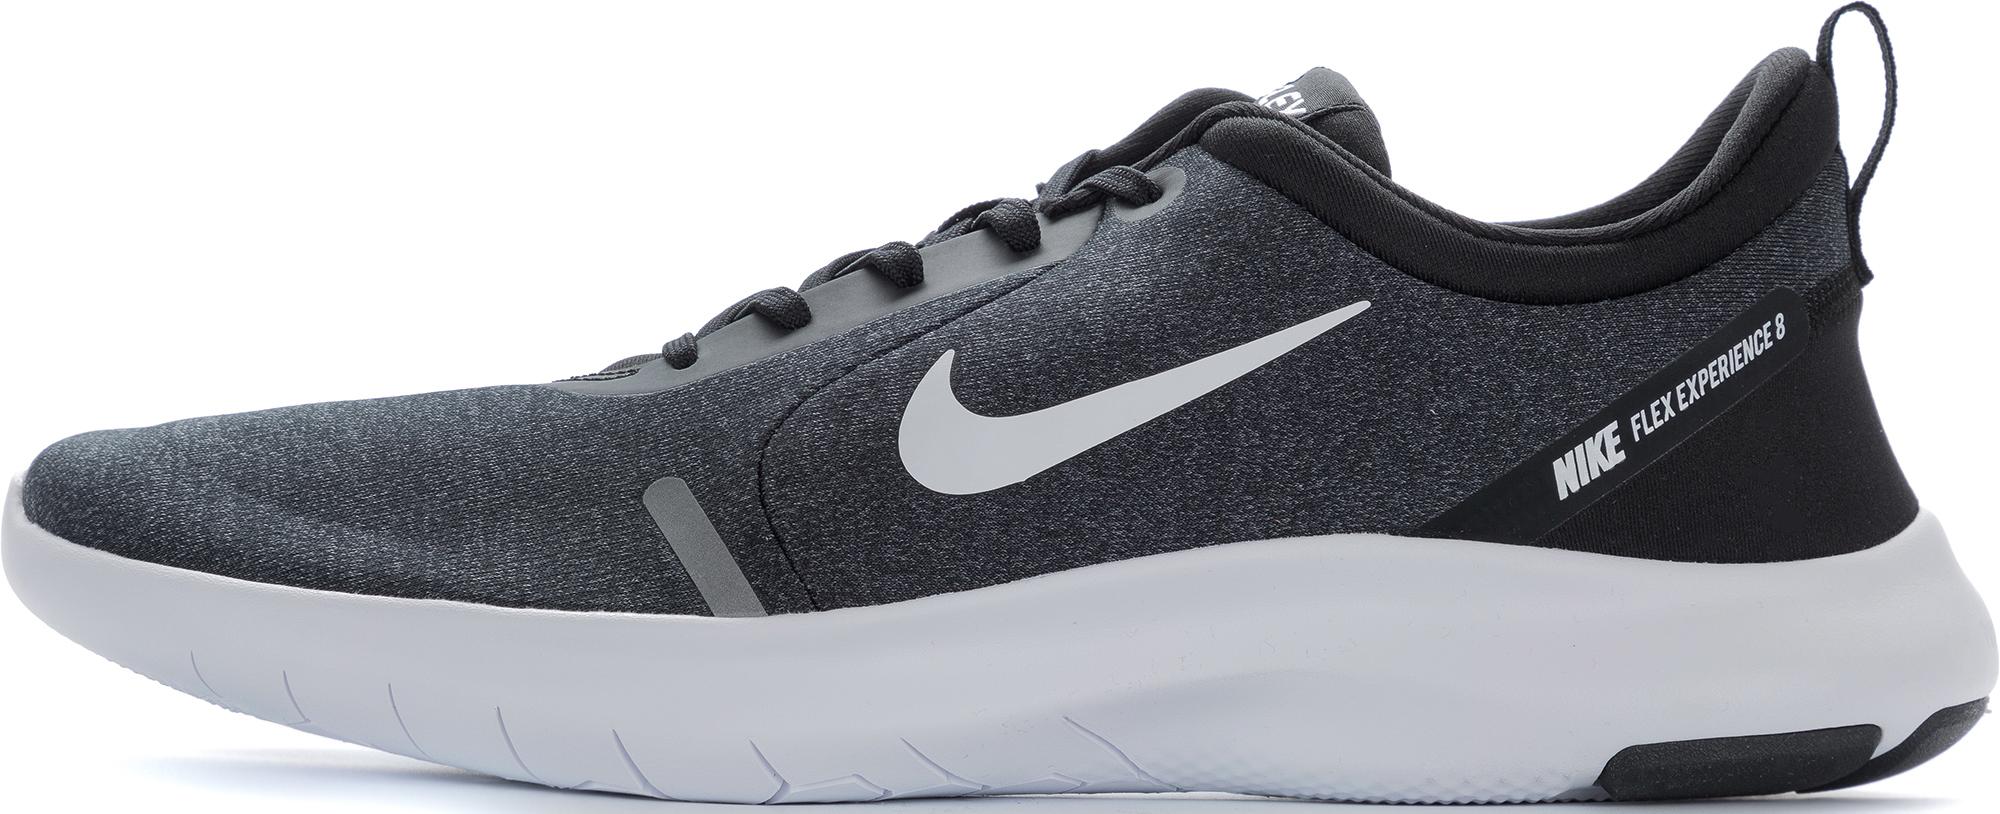 Nike Кроссовки мужские Nike Flex Experience, размер 43